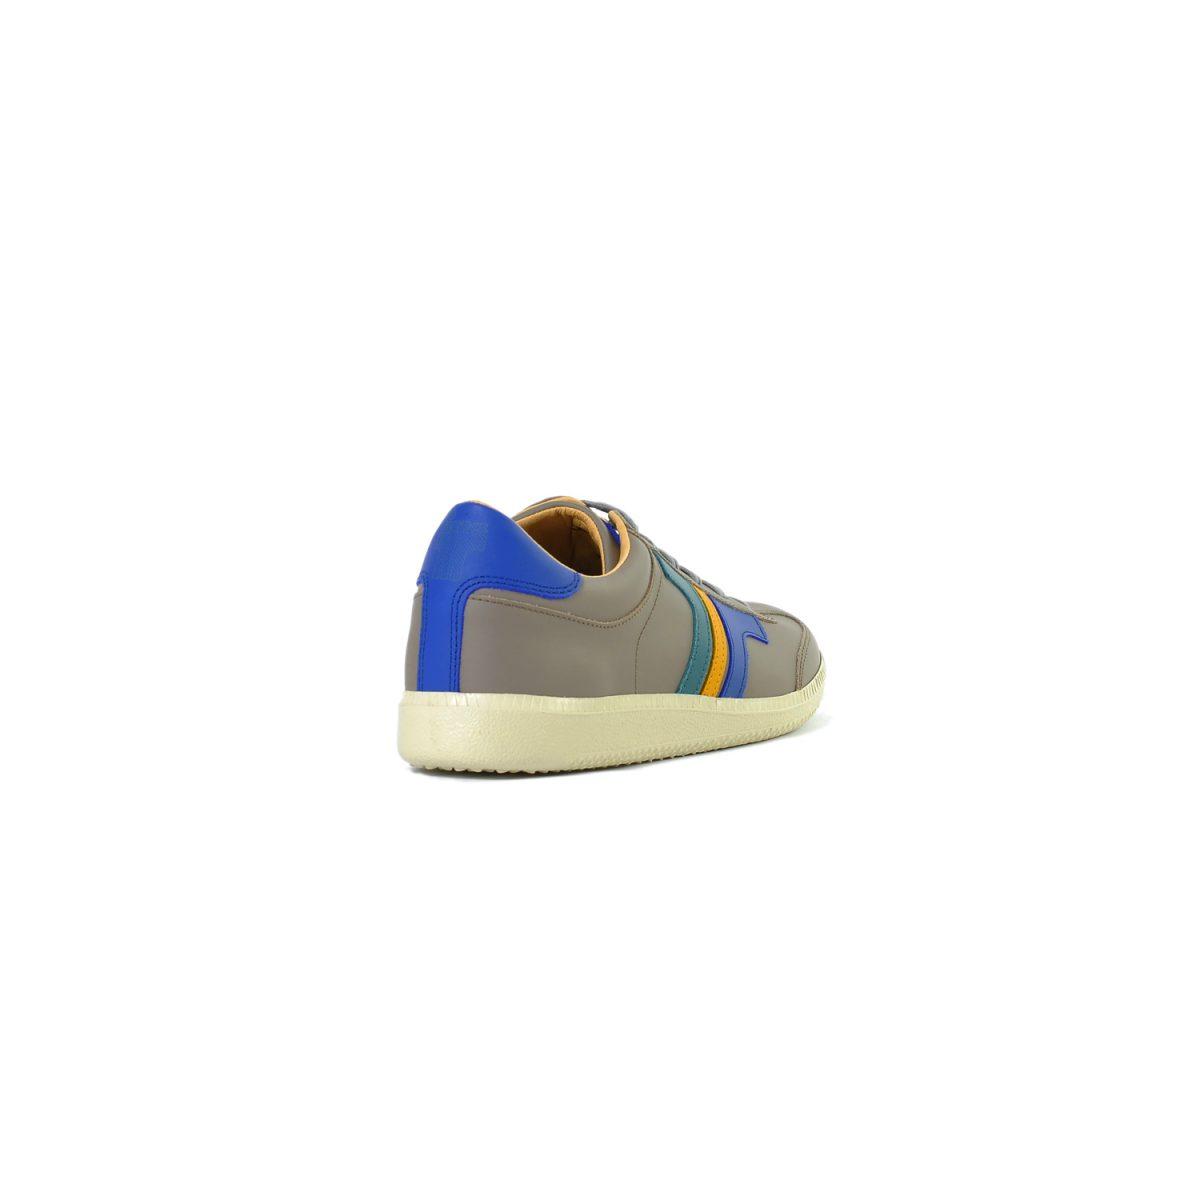 Tisza shoes - Compakt - Earth-ocean